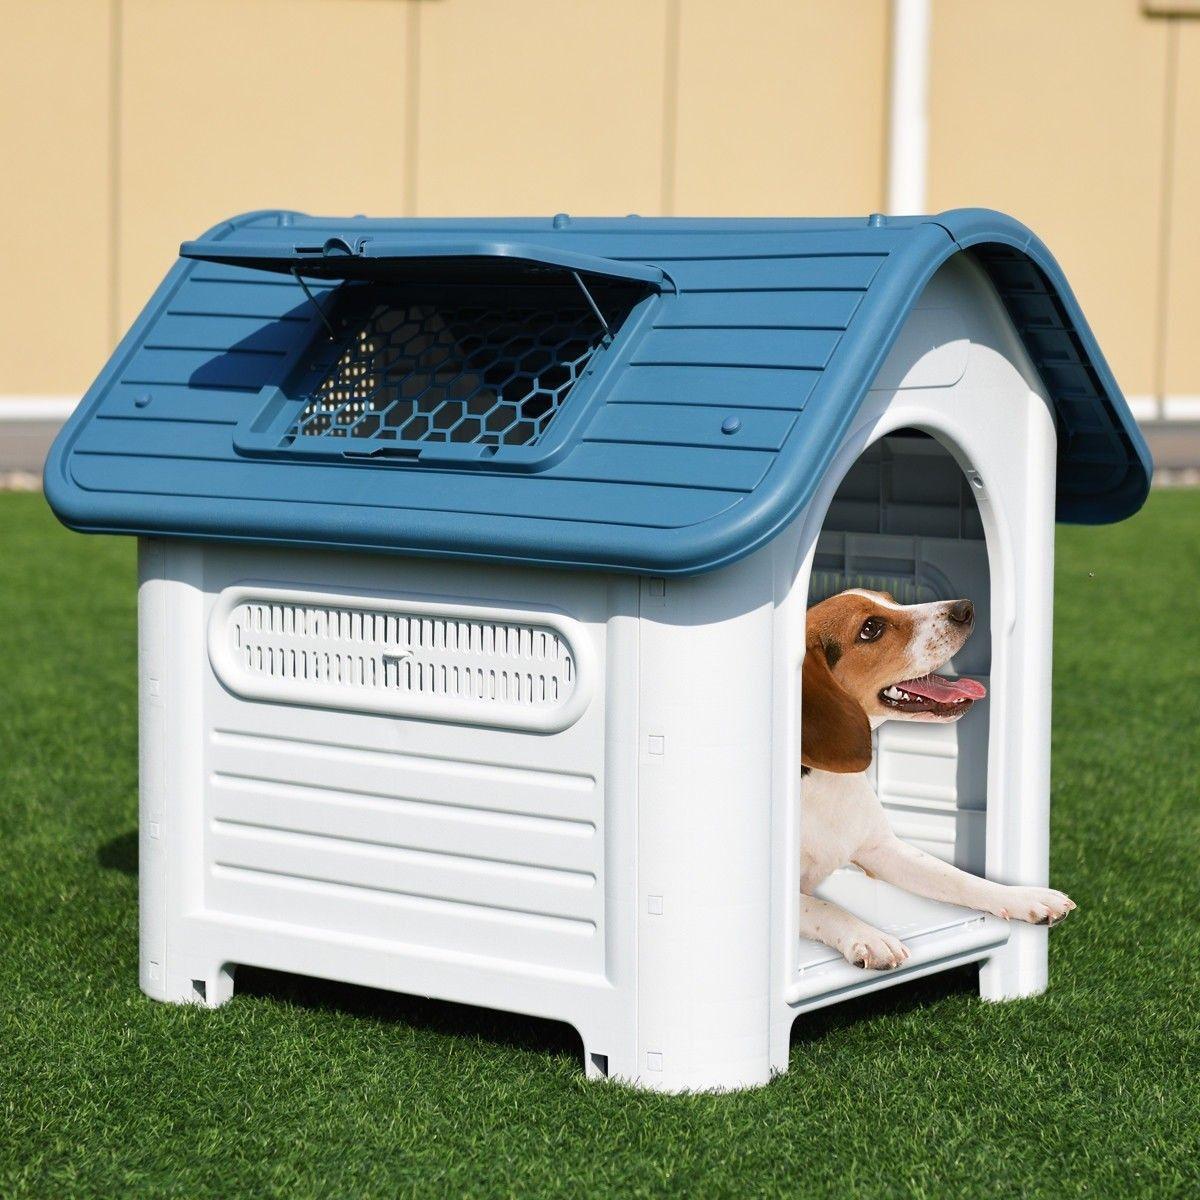 Plastic Pet Dog House Puppy Shelter W Skylight In 2020 Plastic Dog House Indoor Dog House Dog House